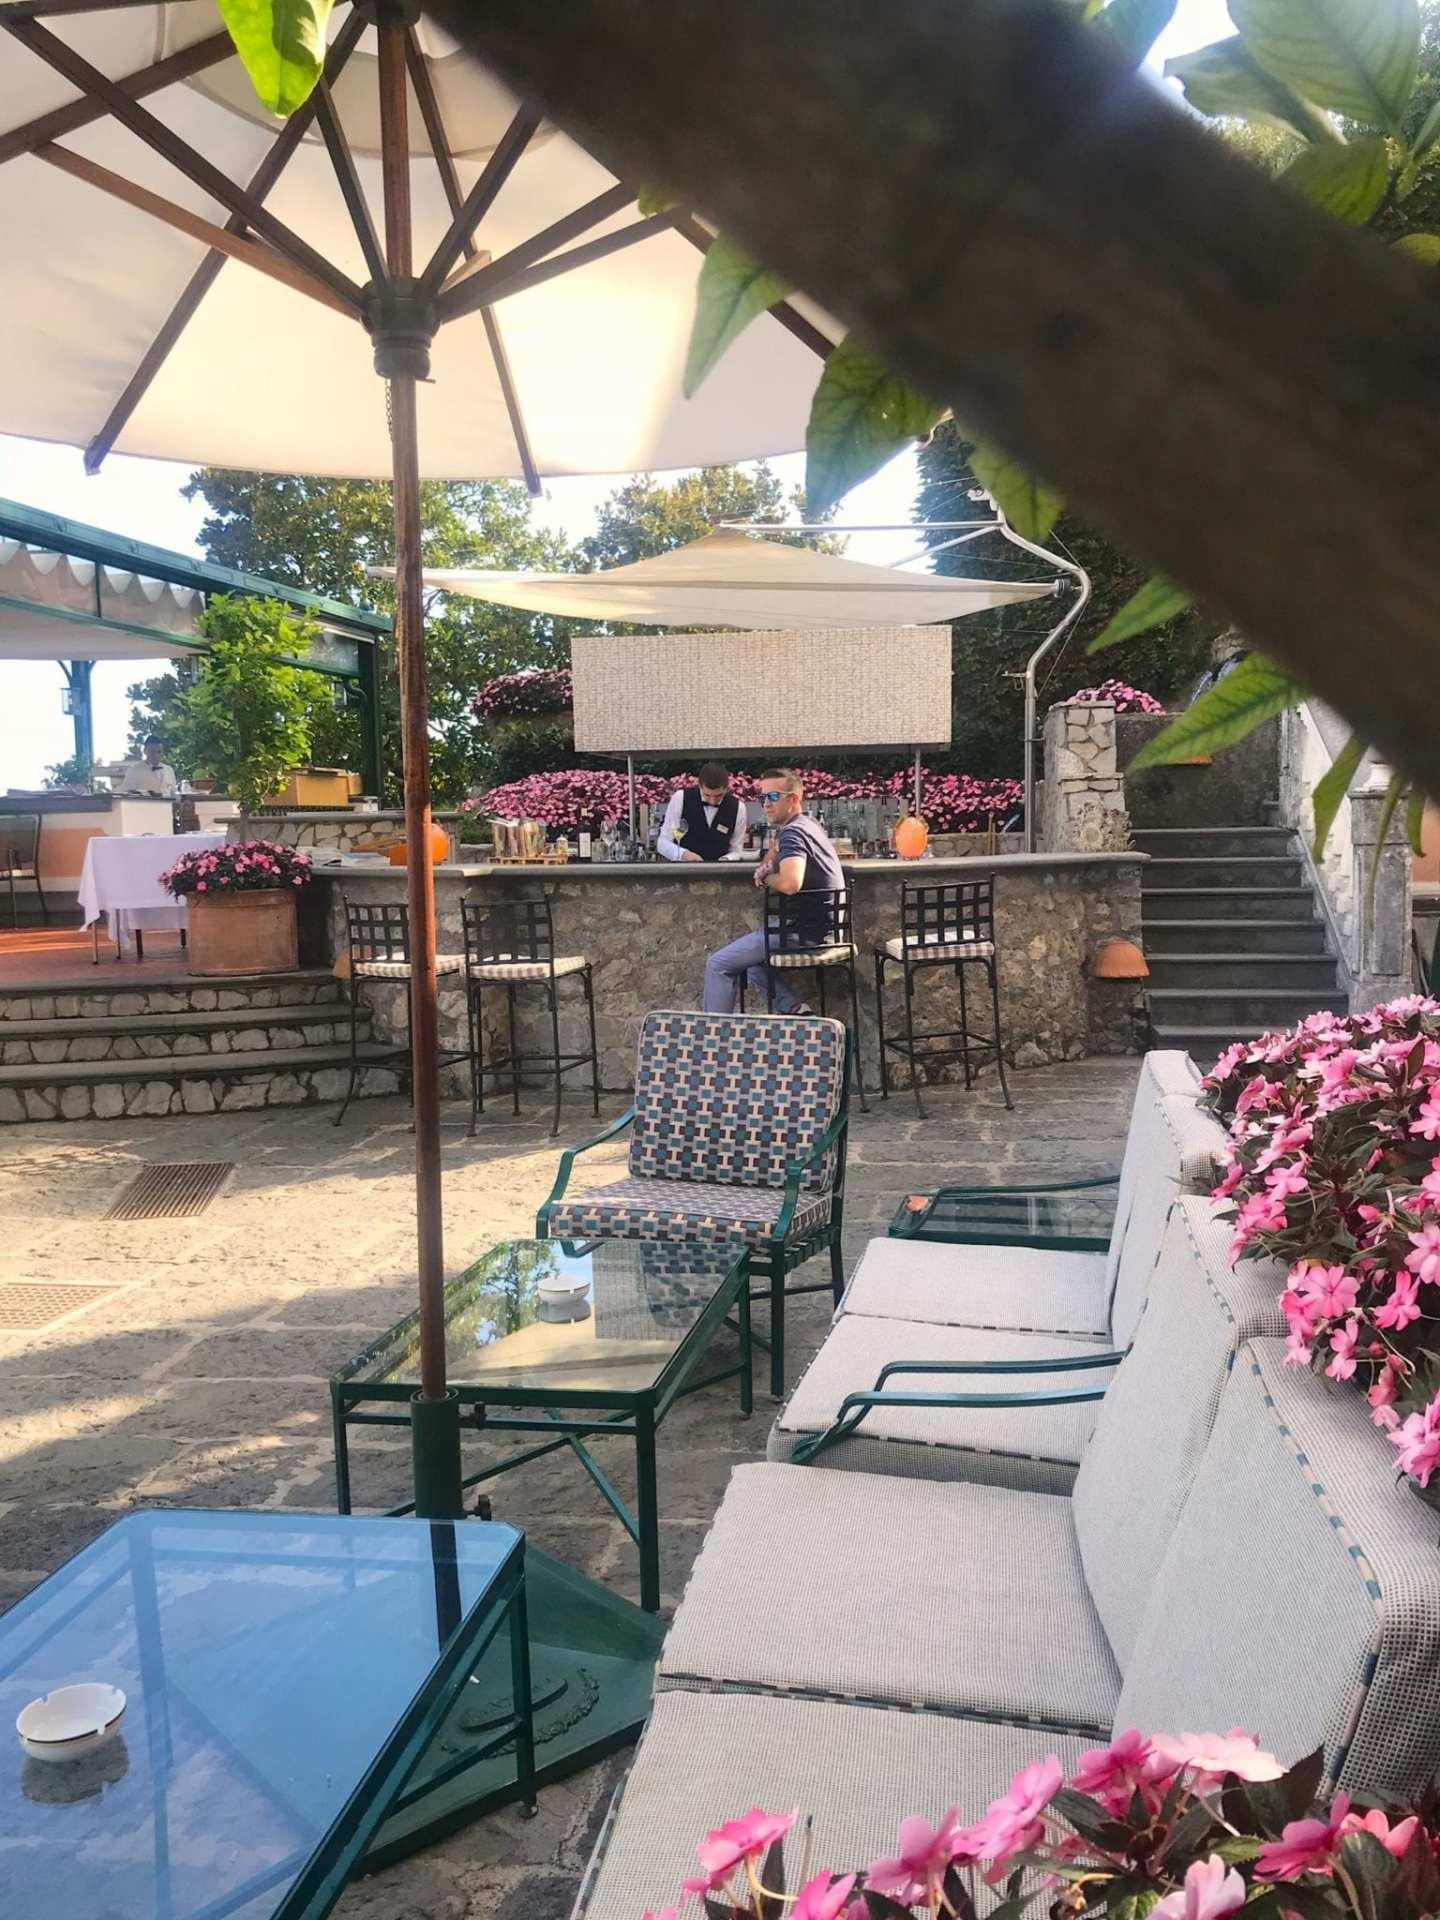 Palazzo Avino bar and restaurant reviews.